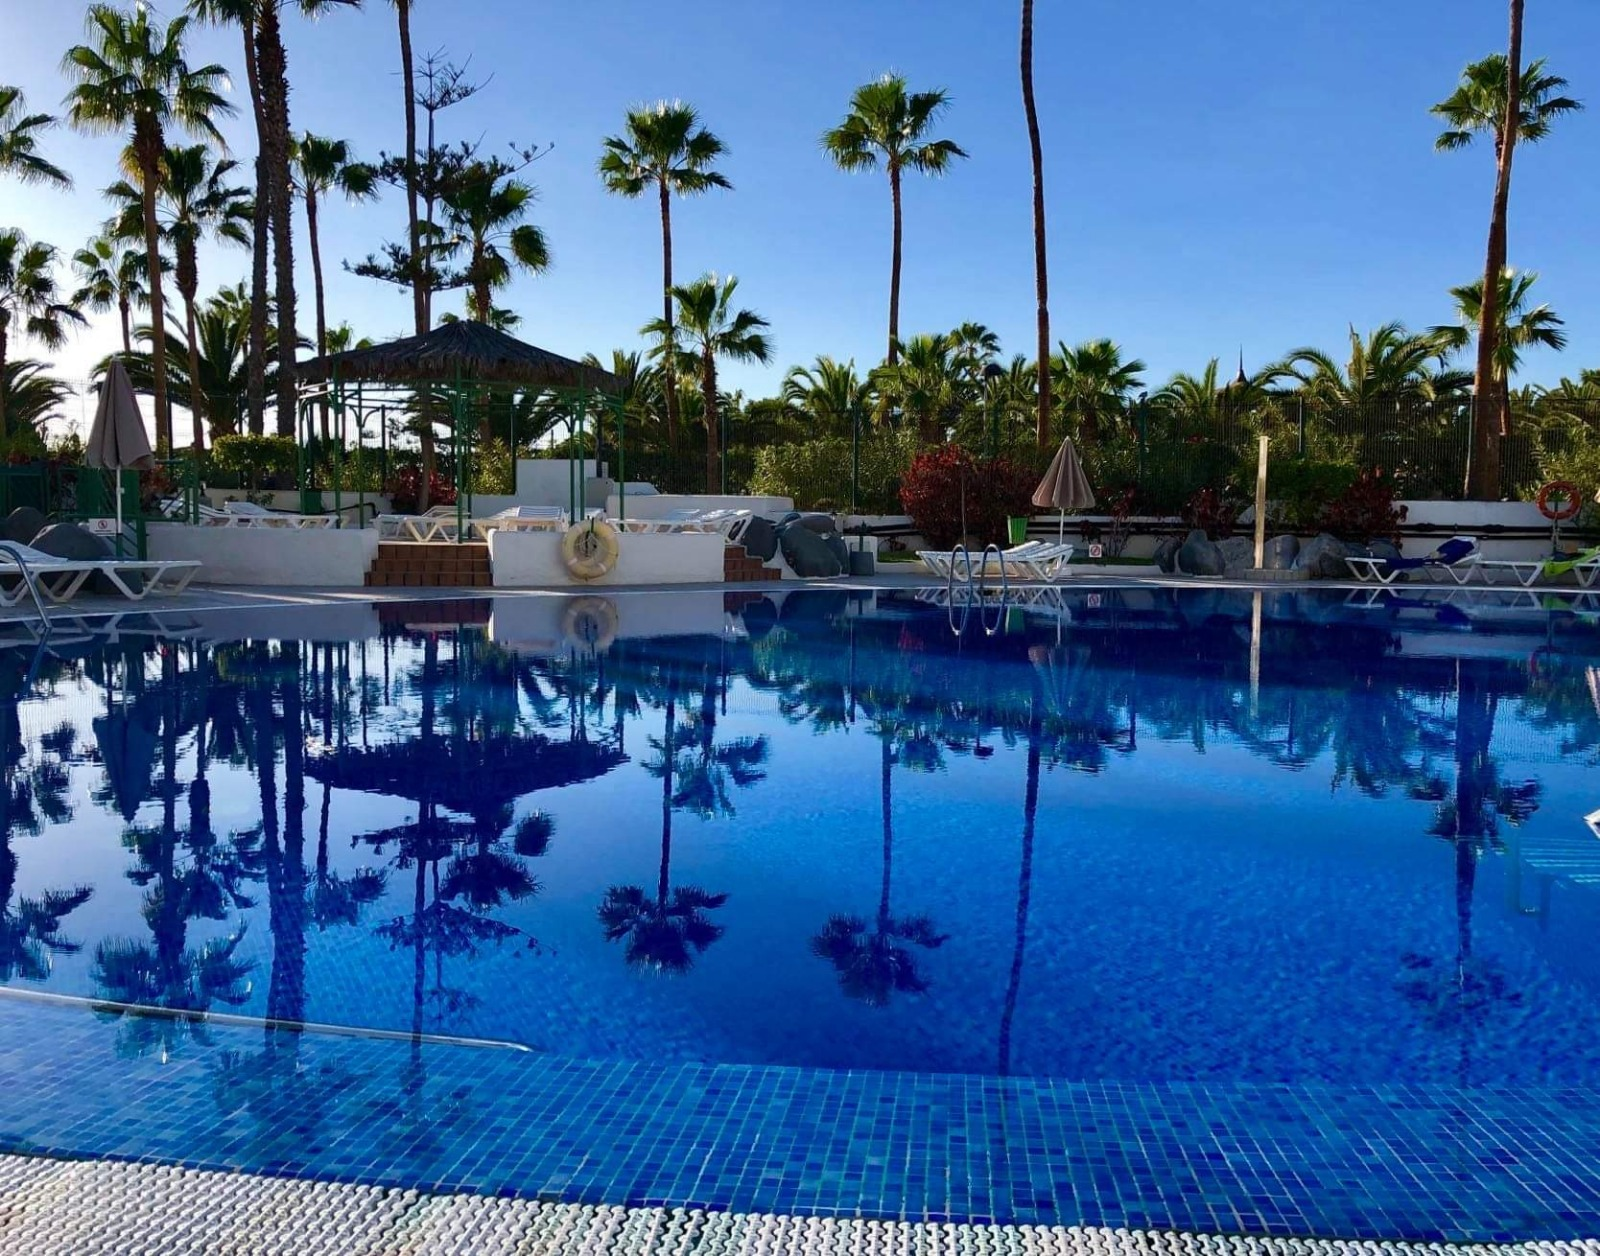 Apartamento en venta en playa de Fañabe – FT2216